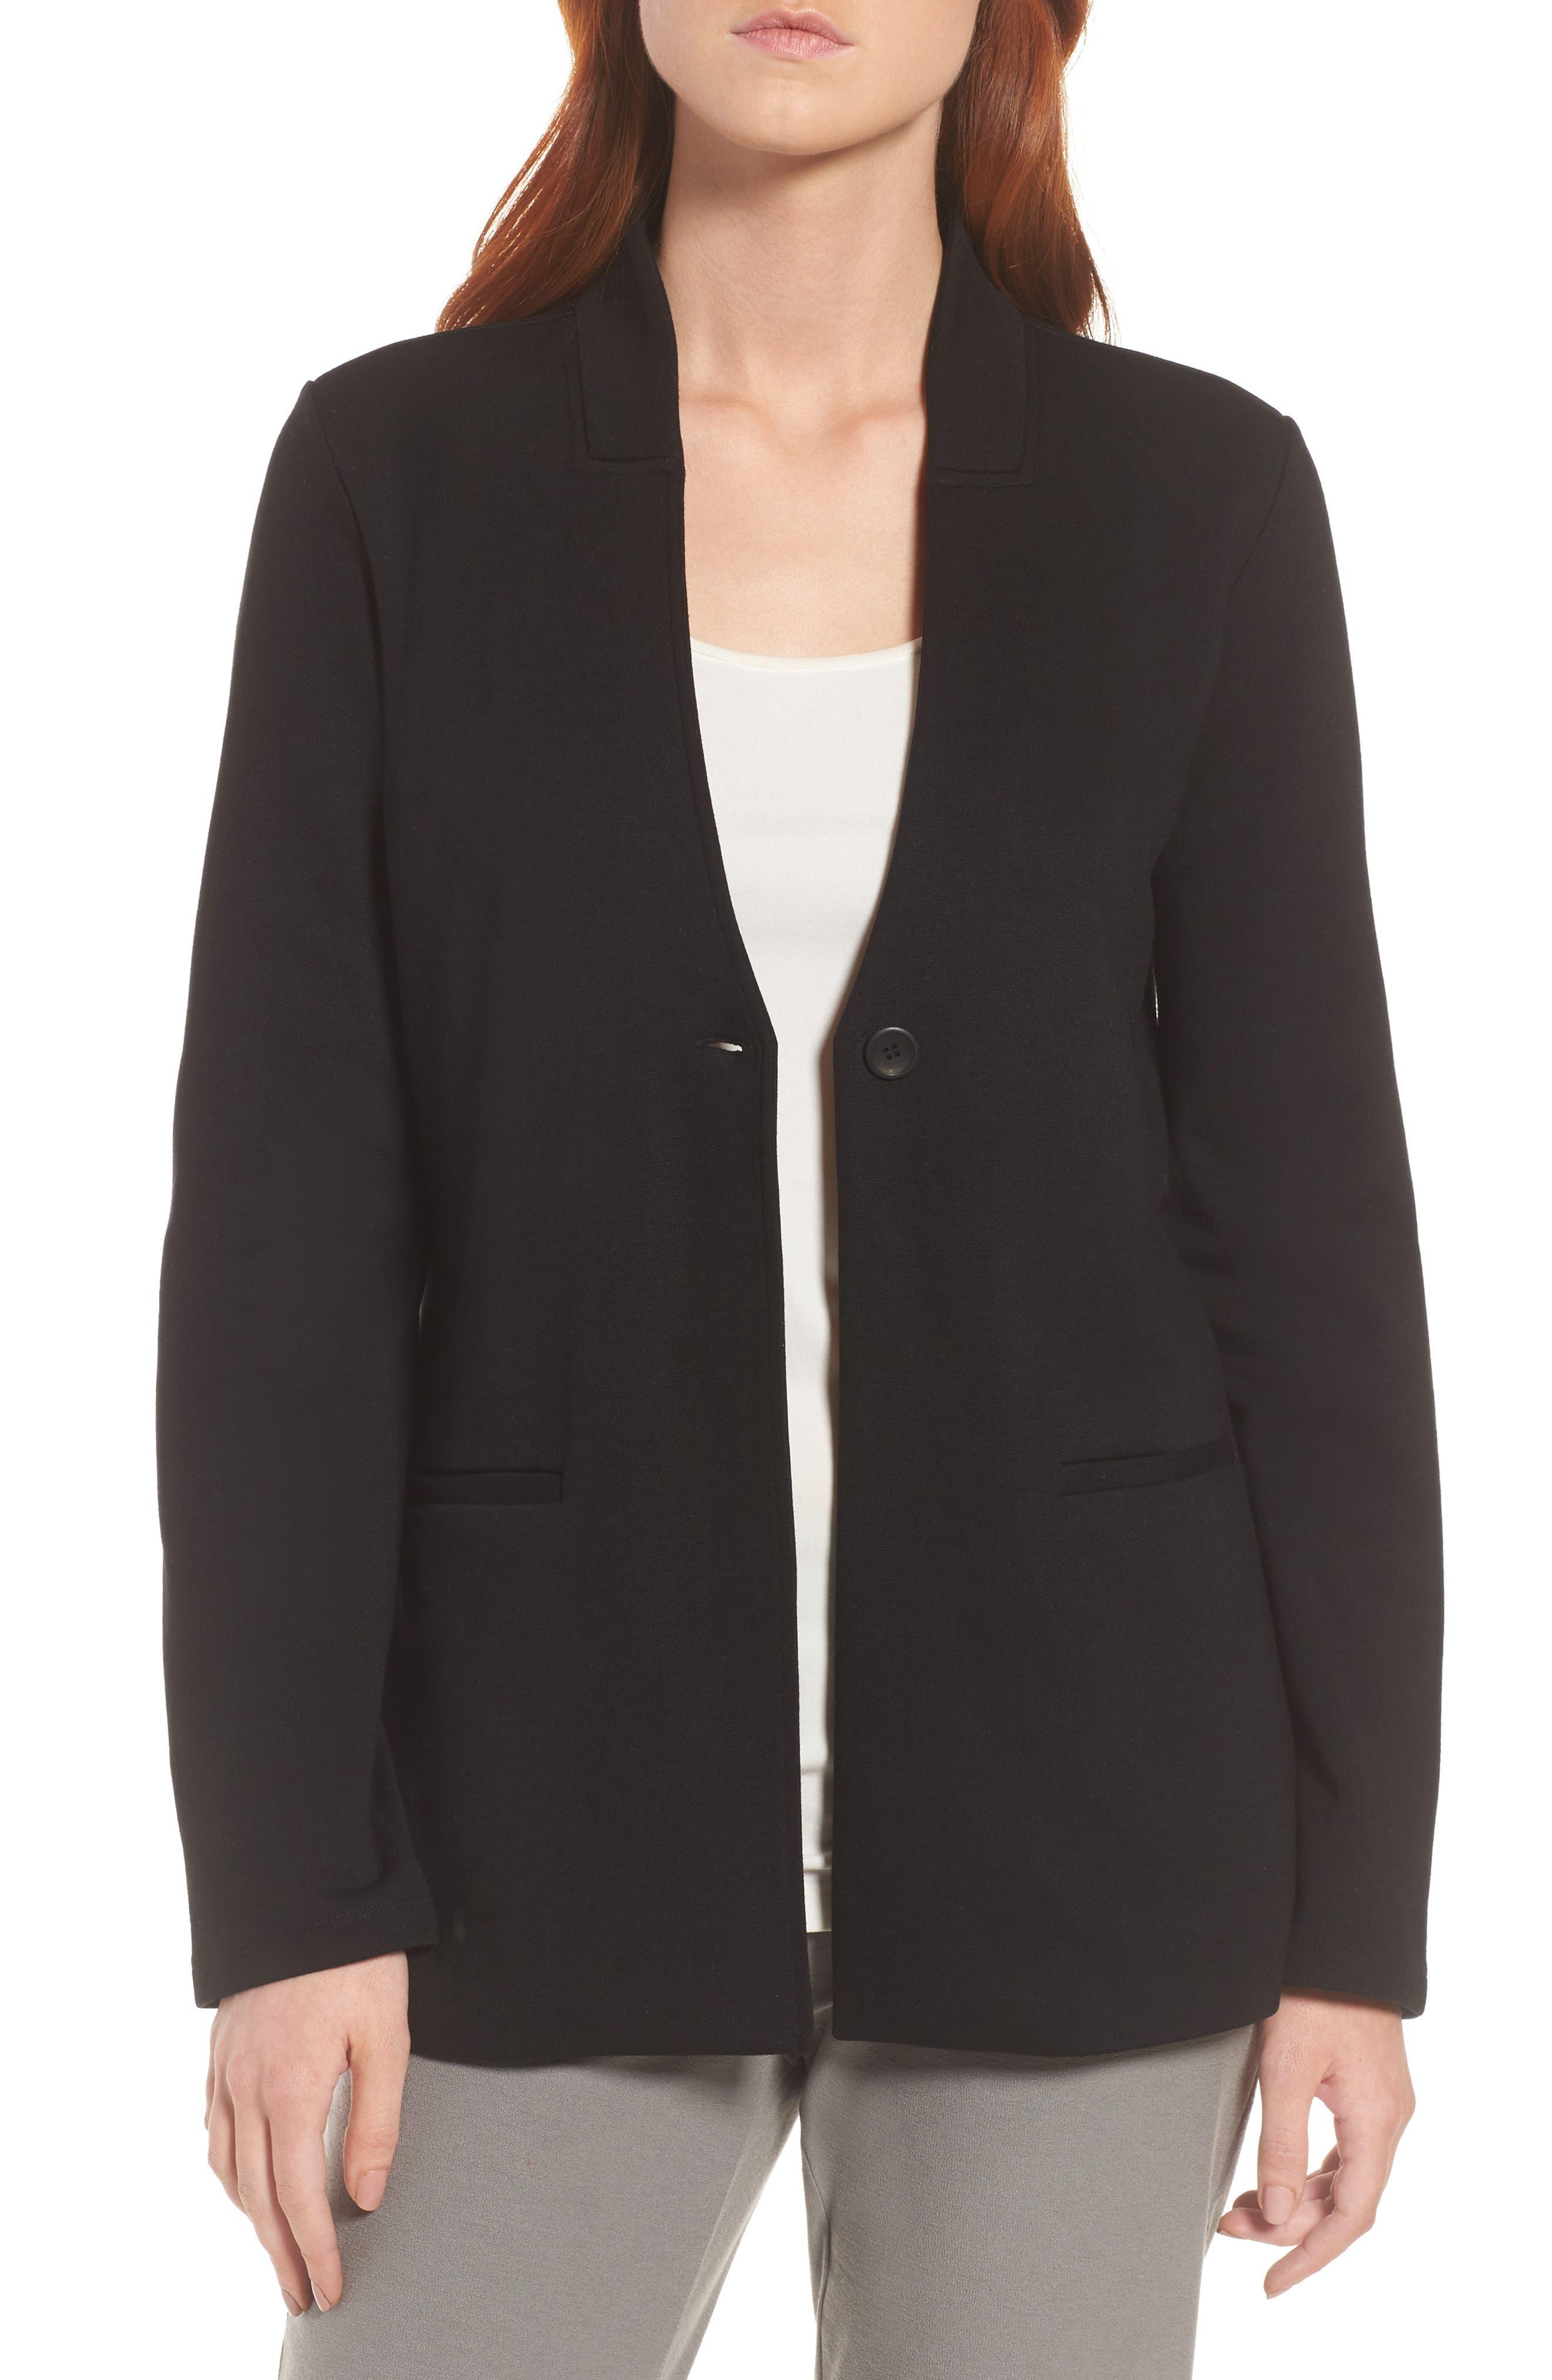 Tencel<sup>®</sup> Lyocell Blend Knit Blazer,                         Main,                         color, Black